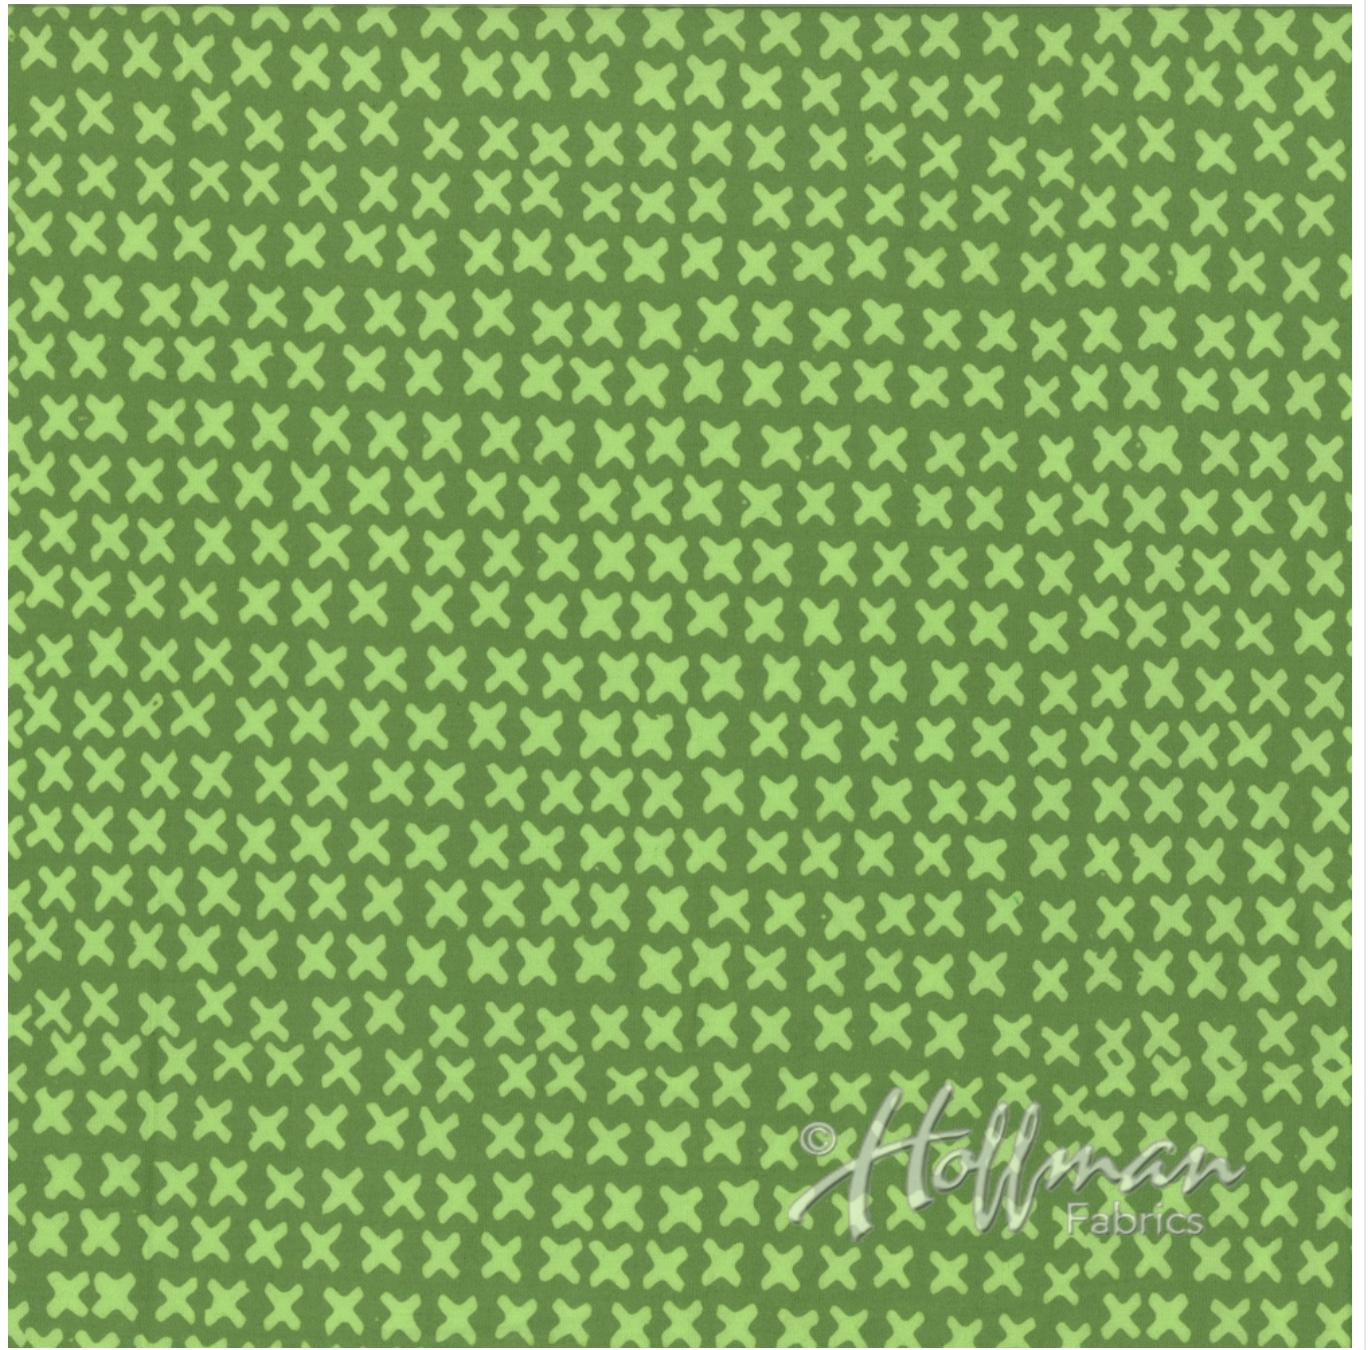 X's Fern - Hand Dyed Batiks - Me + You Hoffman Fabrics 120-220